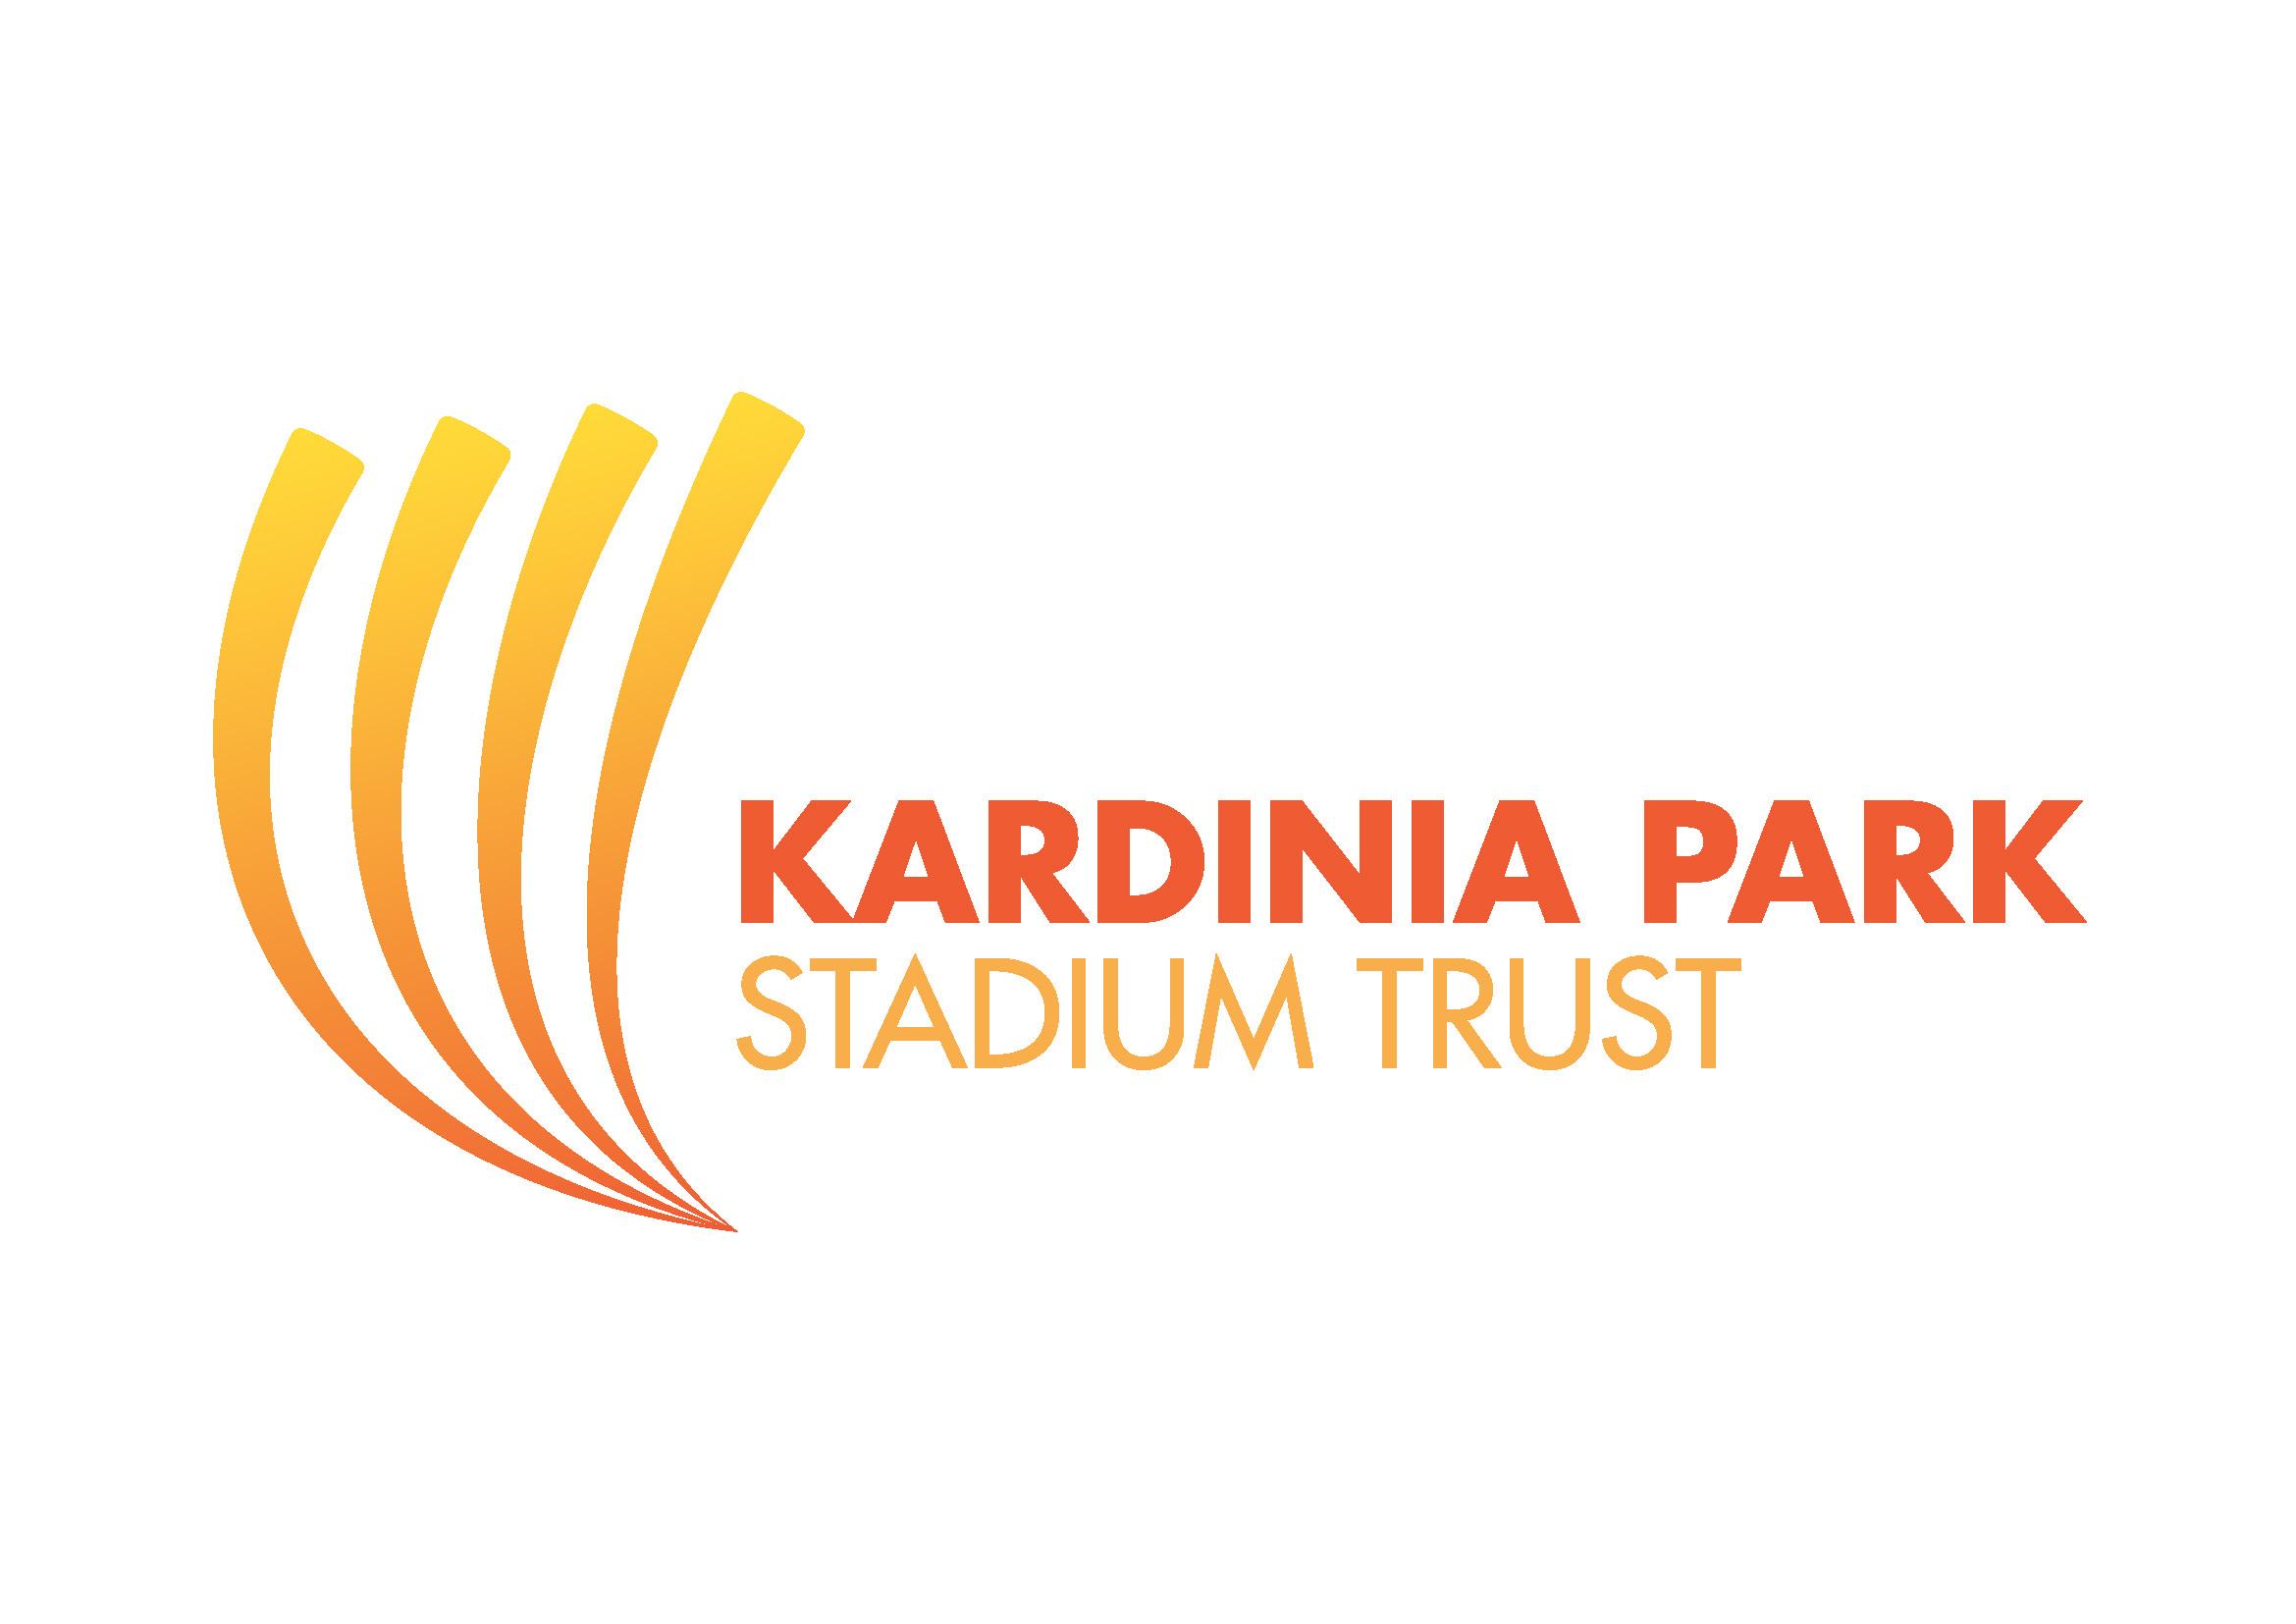 Kardinia Part Stadium Trust logo.Designer:Todd Murphy.